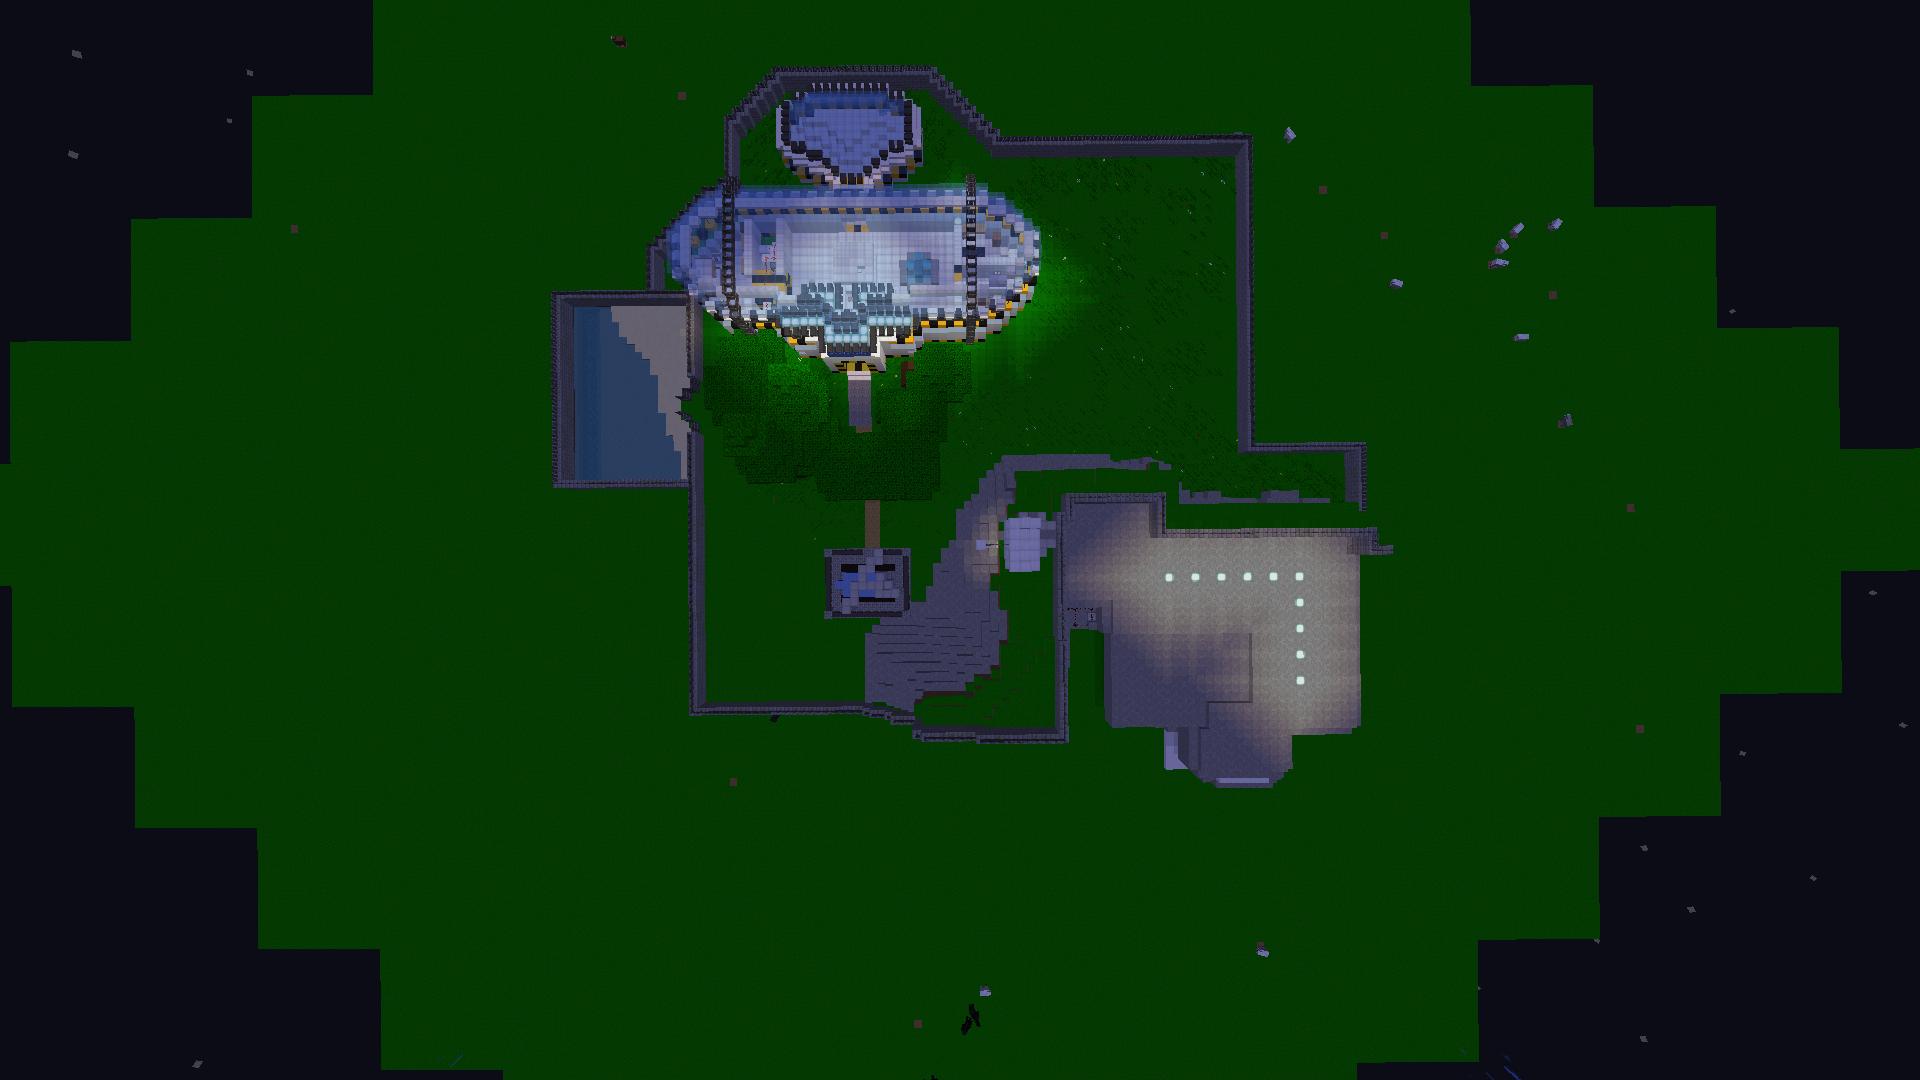 NbaNga's Lab скриншо т2